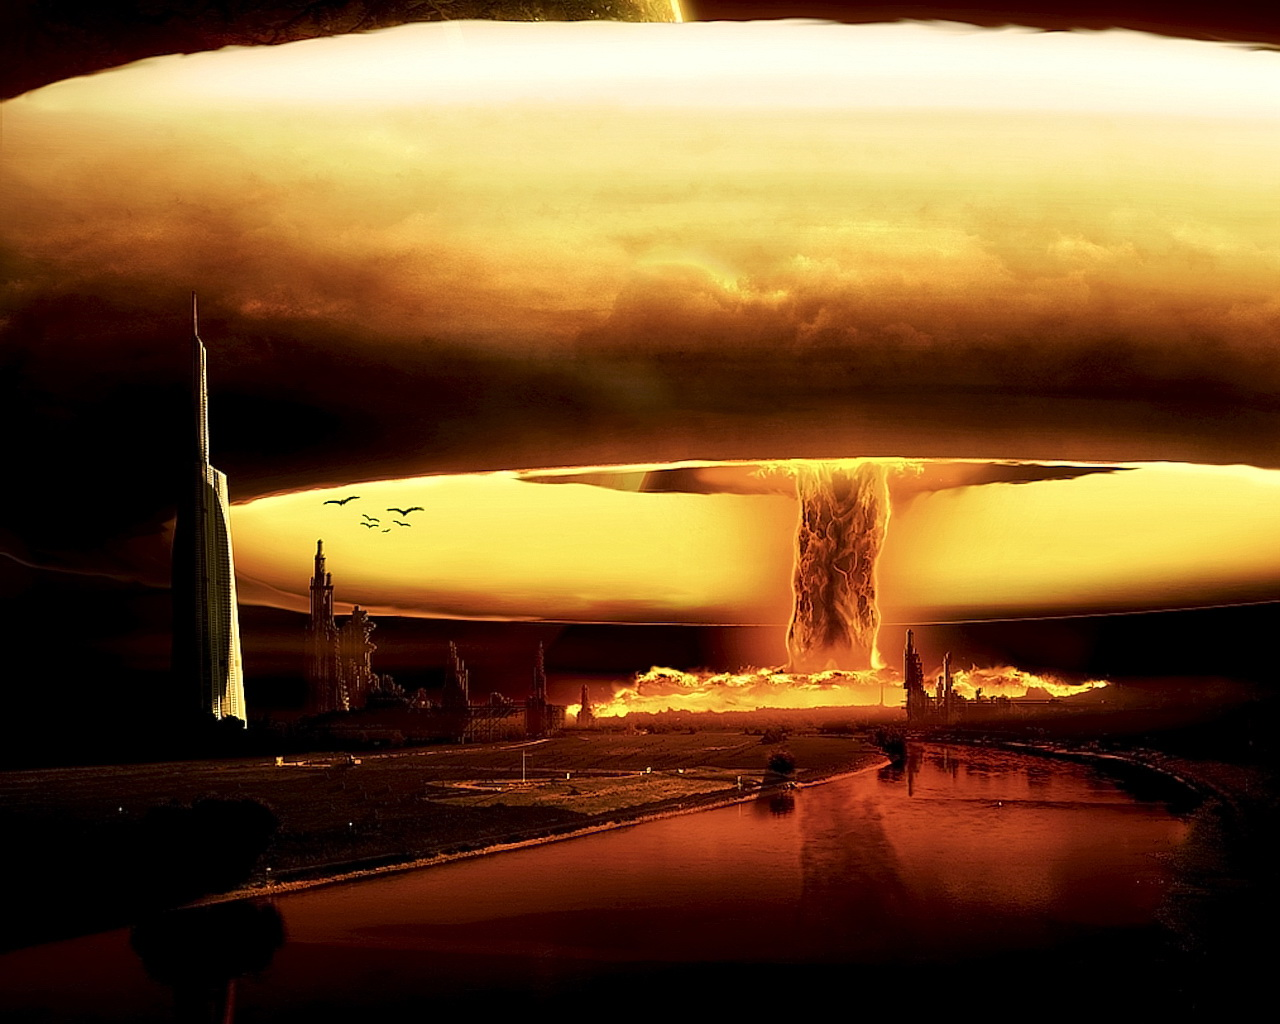 http://2.bp.blogspot.com/-VeLDeFO0rqg/T5u_swI1NFI/AAAAAAAAIRg/Cm8c2ZVHG6U/s1600/Photoshop_The_nuclear_explosion___bomb_011528_.jpg